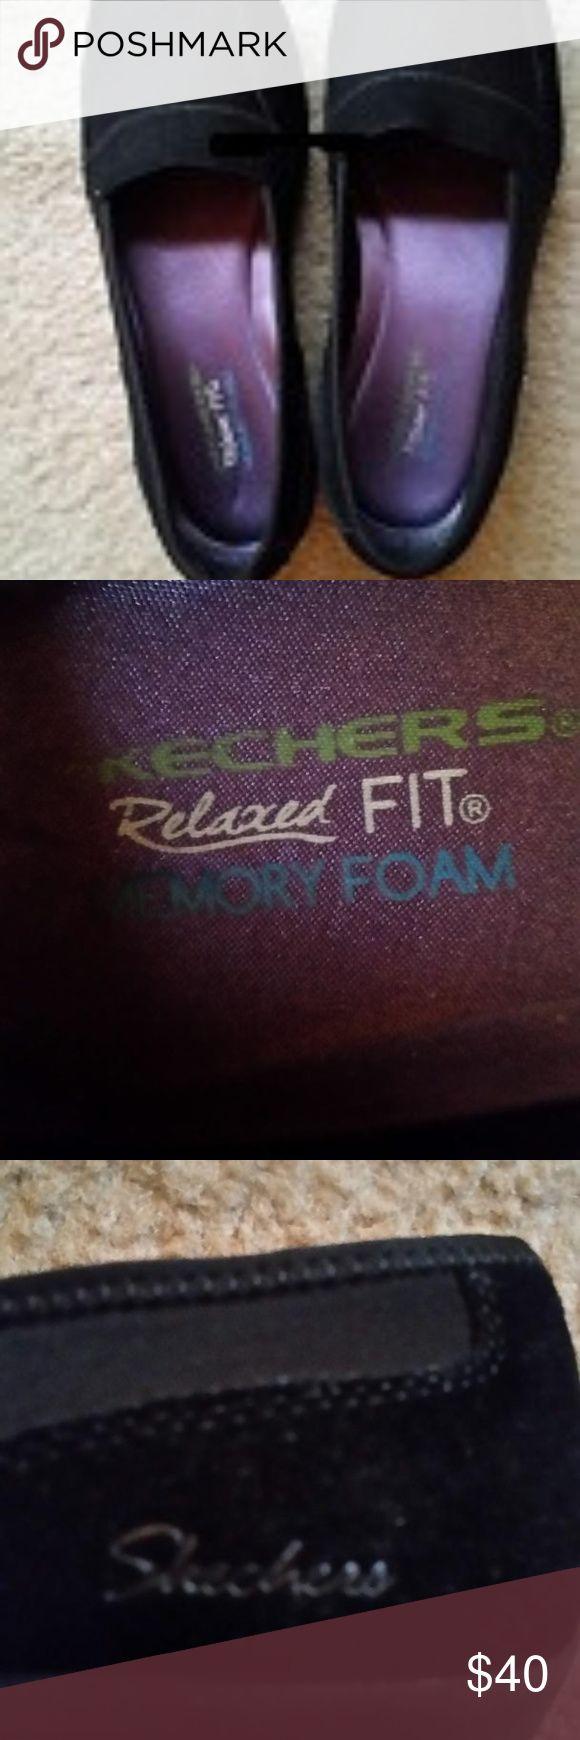 Black Skechers Memory Foam Shoes Black dress/causal, Skechers Memory Foam Relaxed Fit Shoes. Look brand new. Skechers Shoes Flats & Loafers